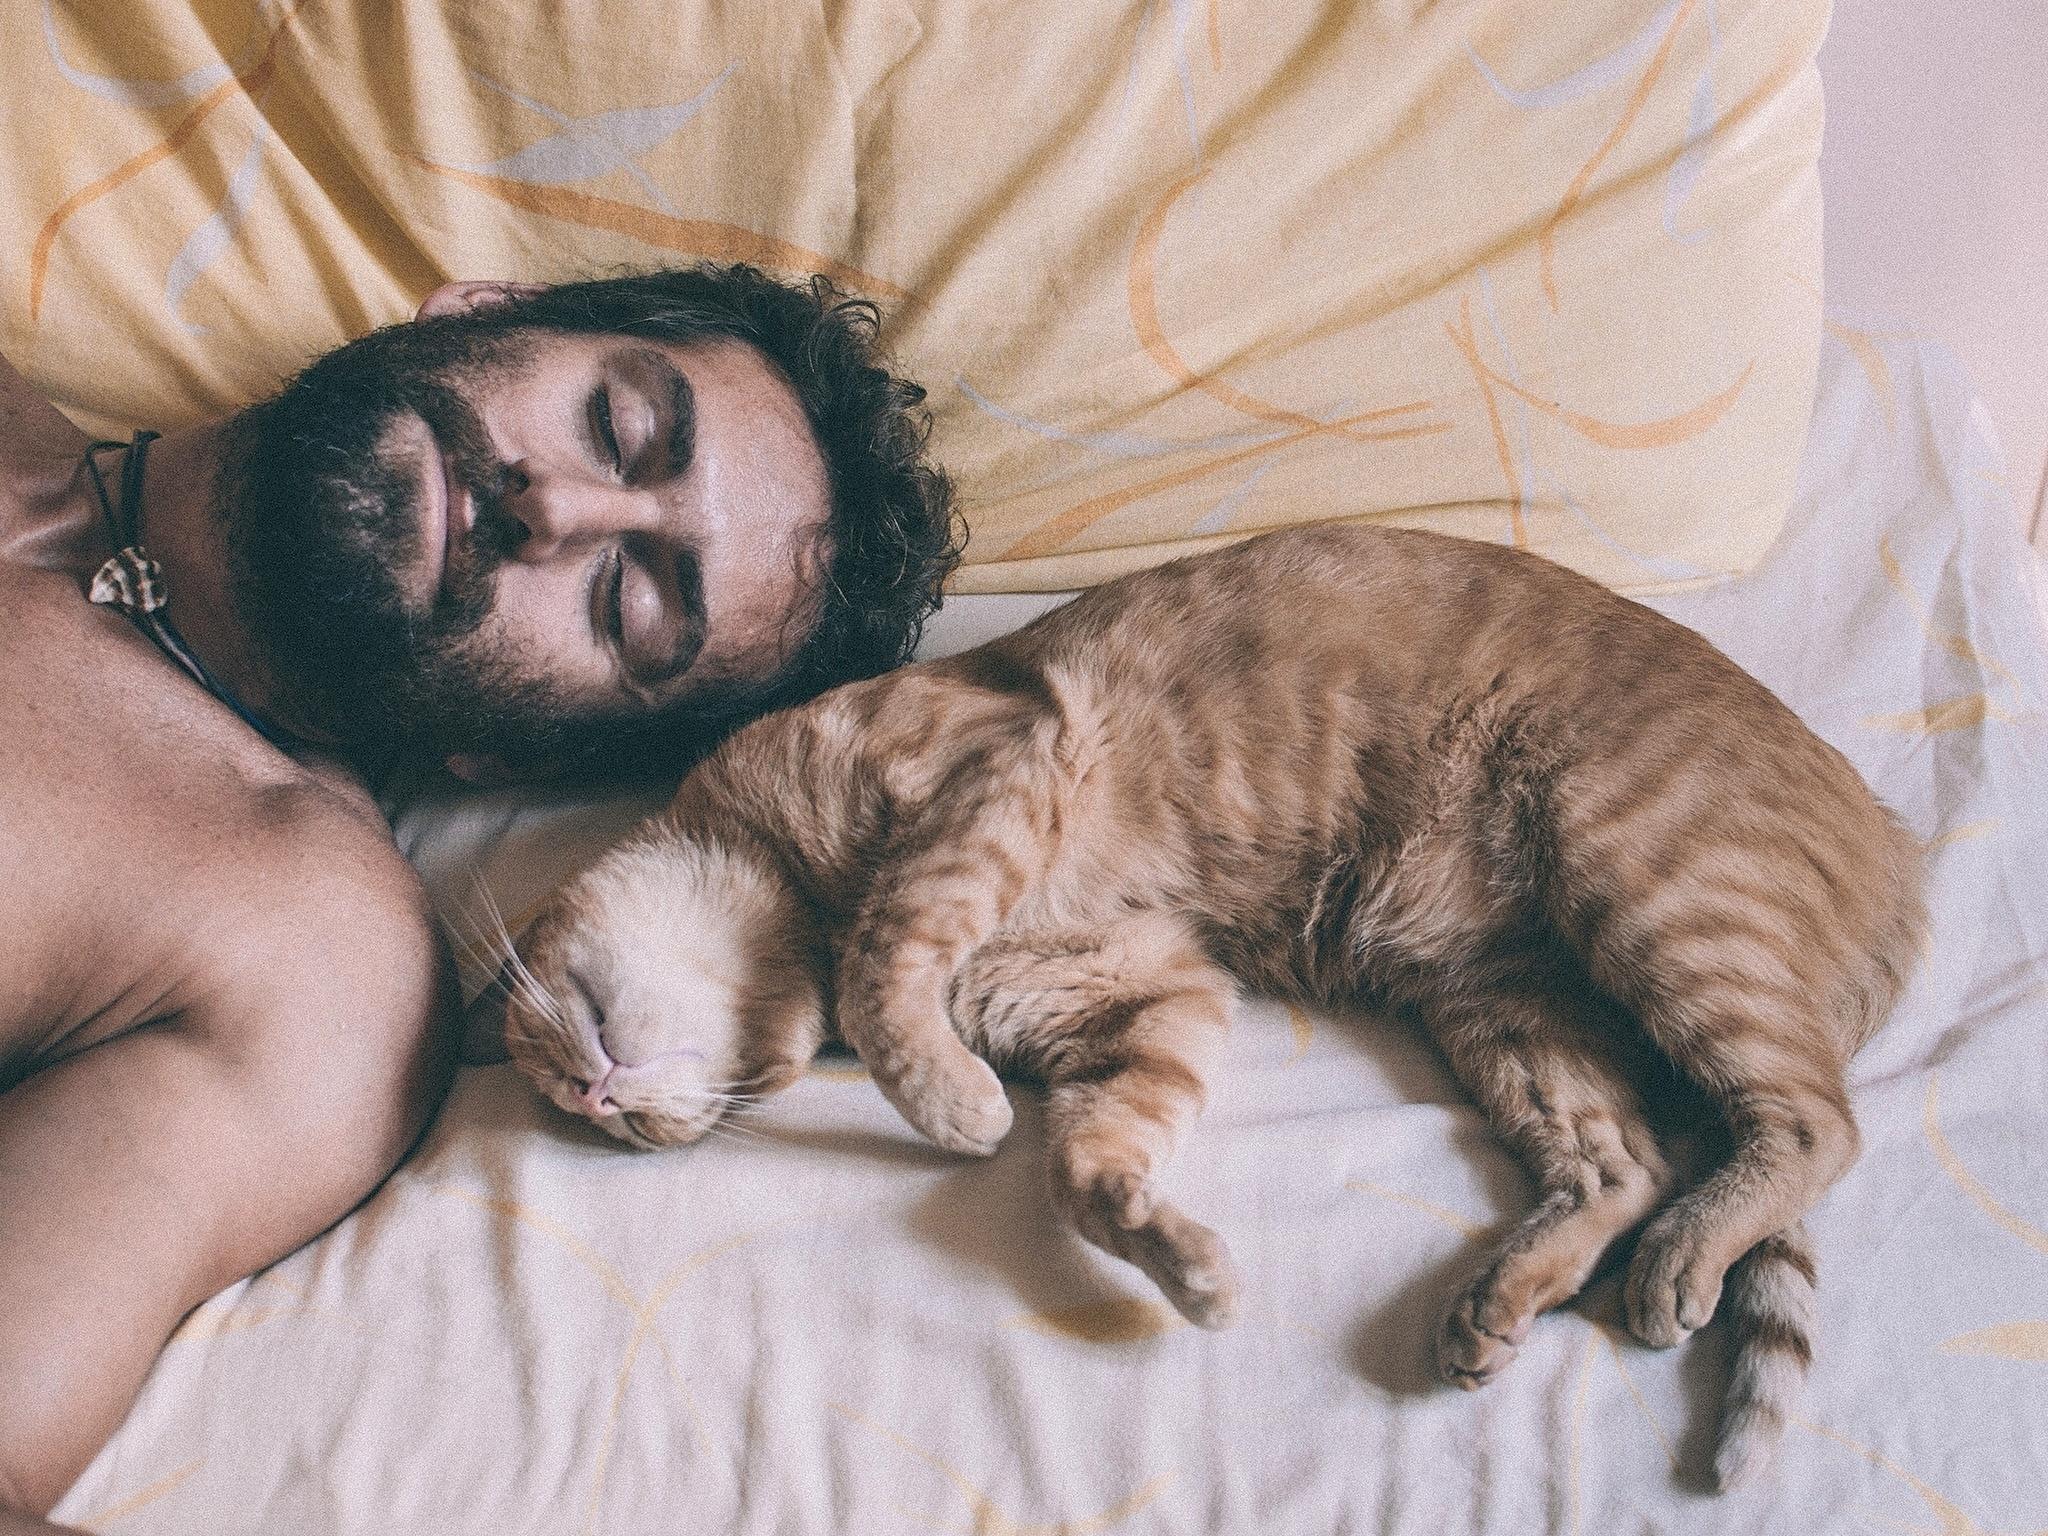 Cats Men Beard Sleep 463705 2048x1536